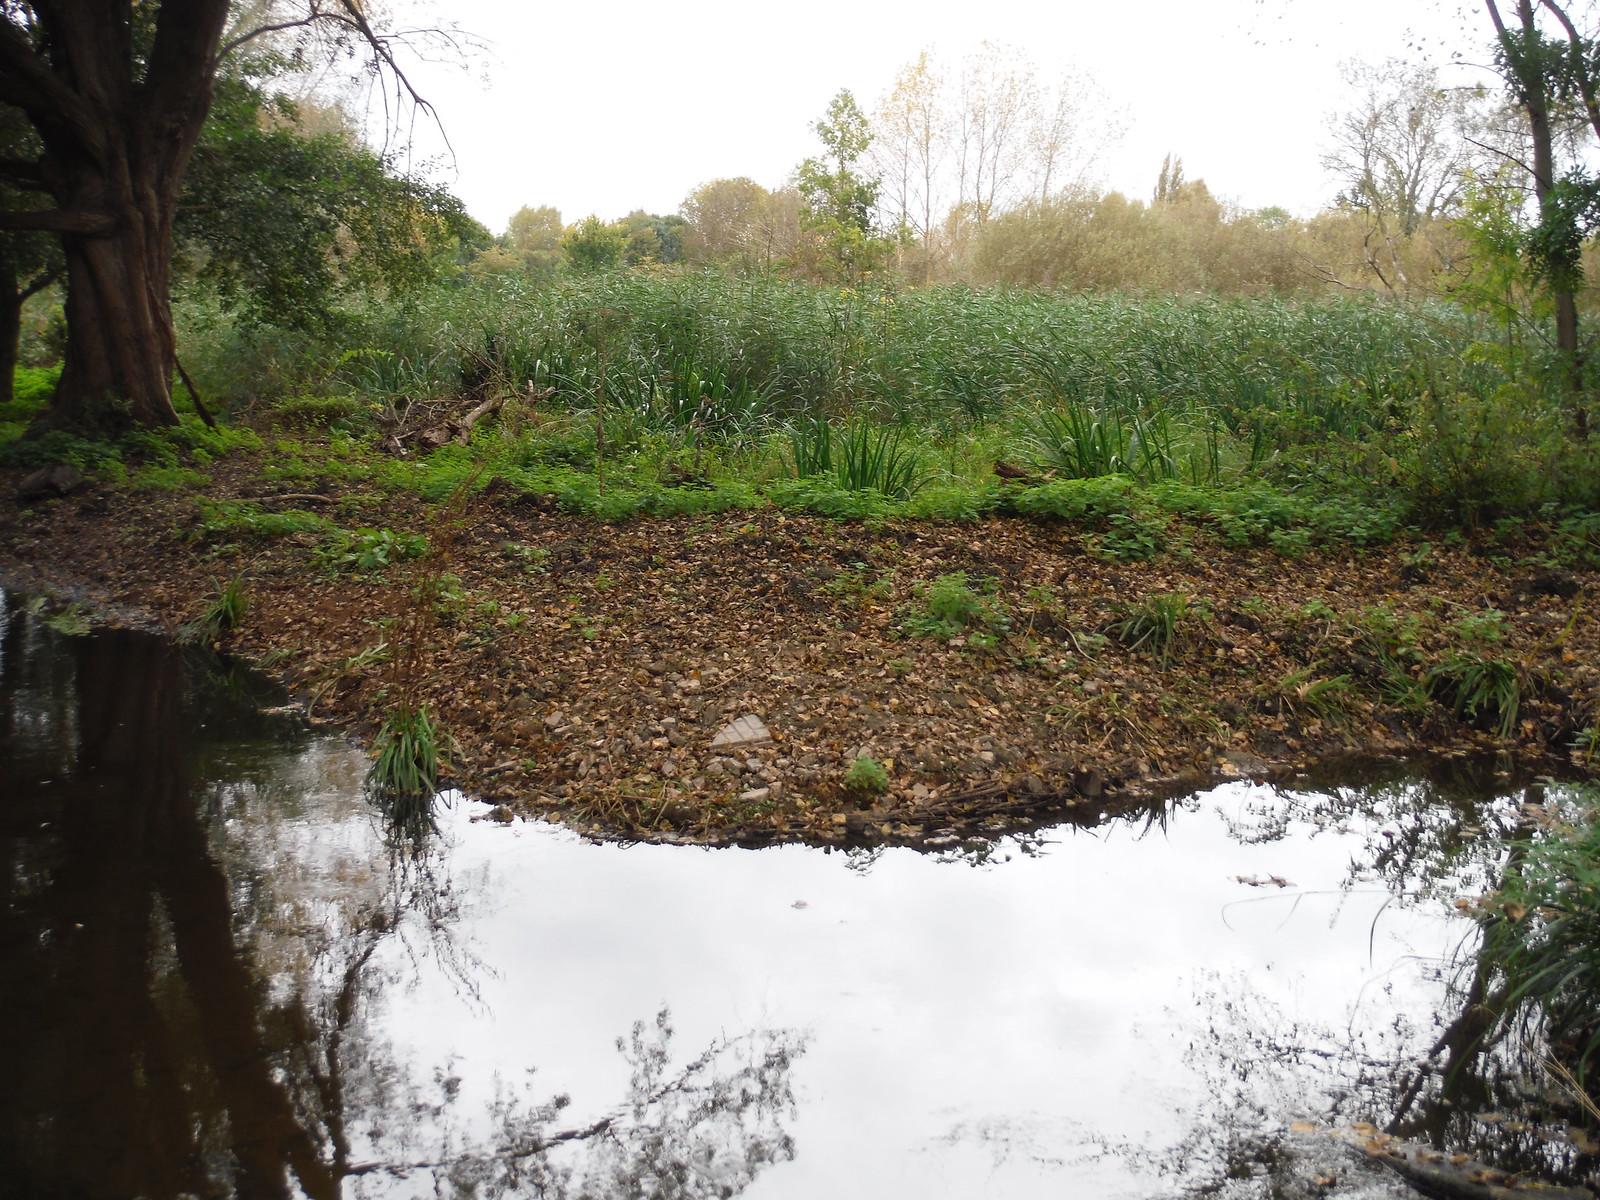 Wetlands, Morden Hall Park SWC Walk Short 13 - Morden Hall Park and Merton Abbey Mills